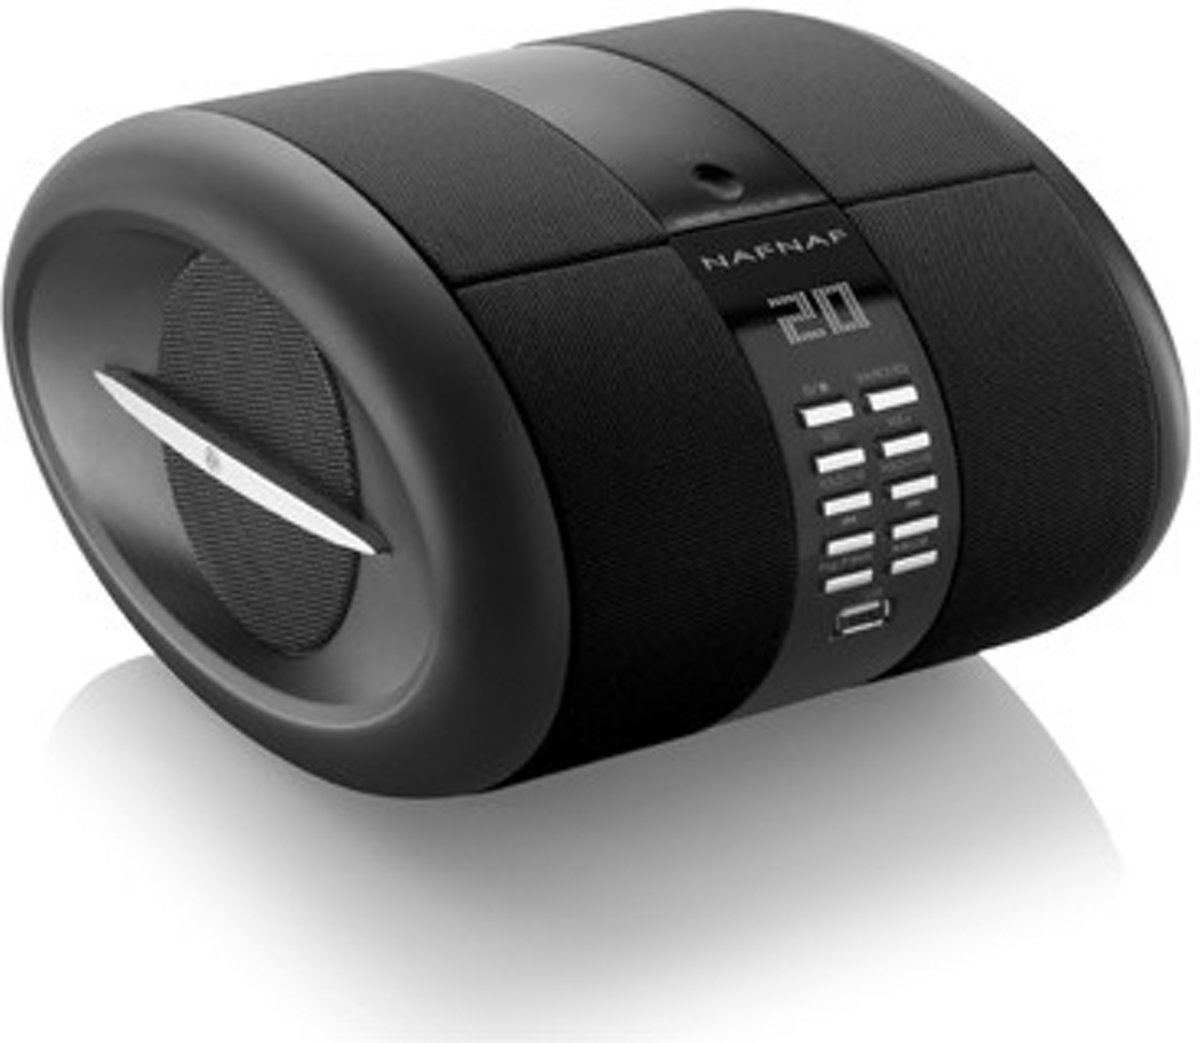 Sense, portable radio CD BT FM USB, black